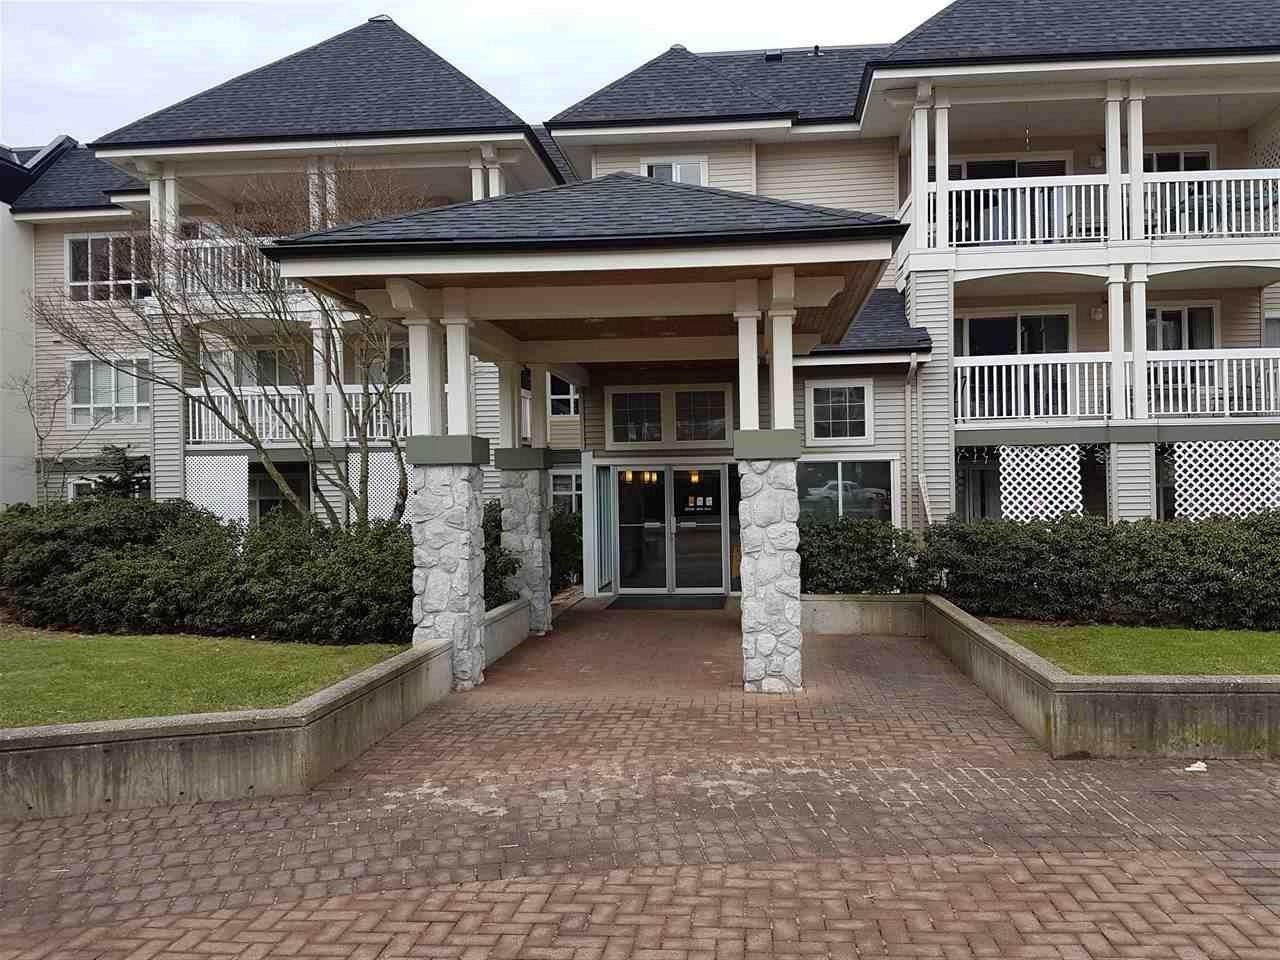 R2131355 - 124 22020 49TH AVENUE, Murrayville, Langley, BC - Apartment Unit